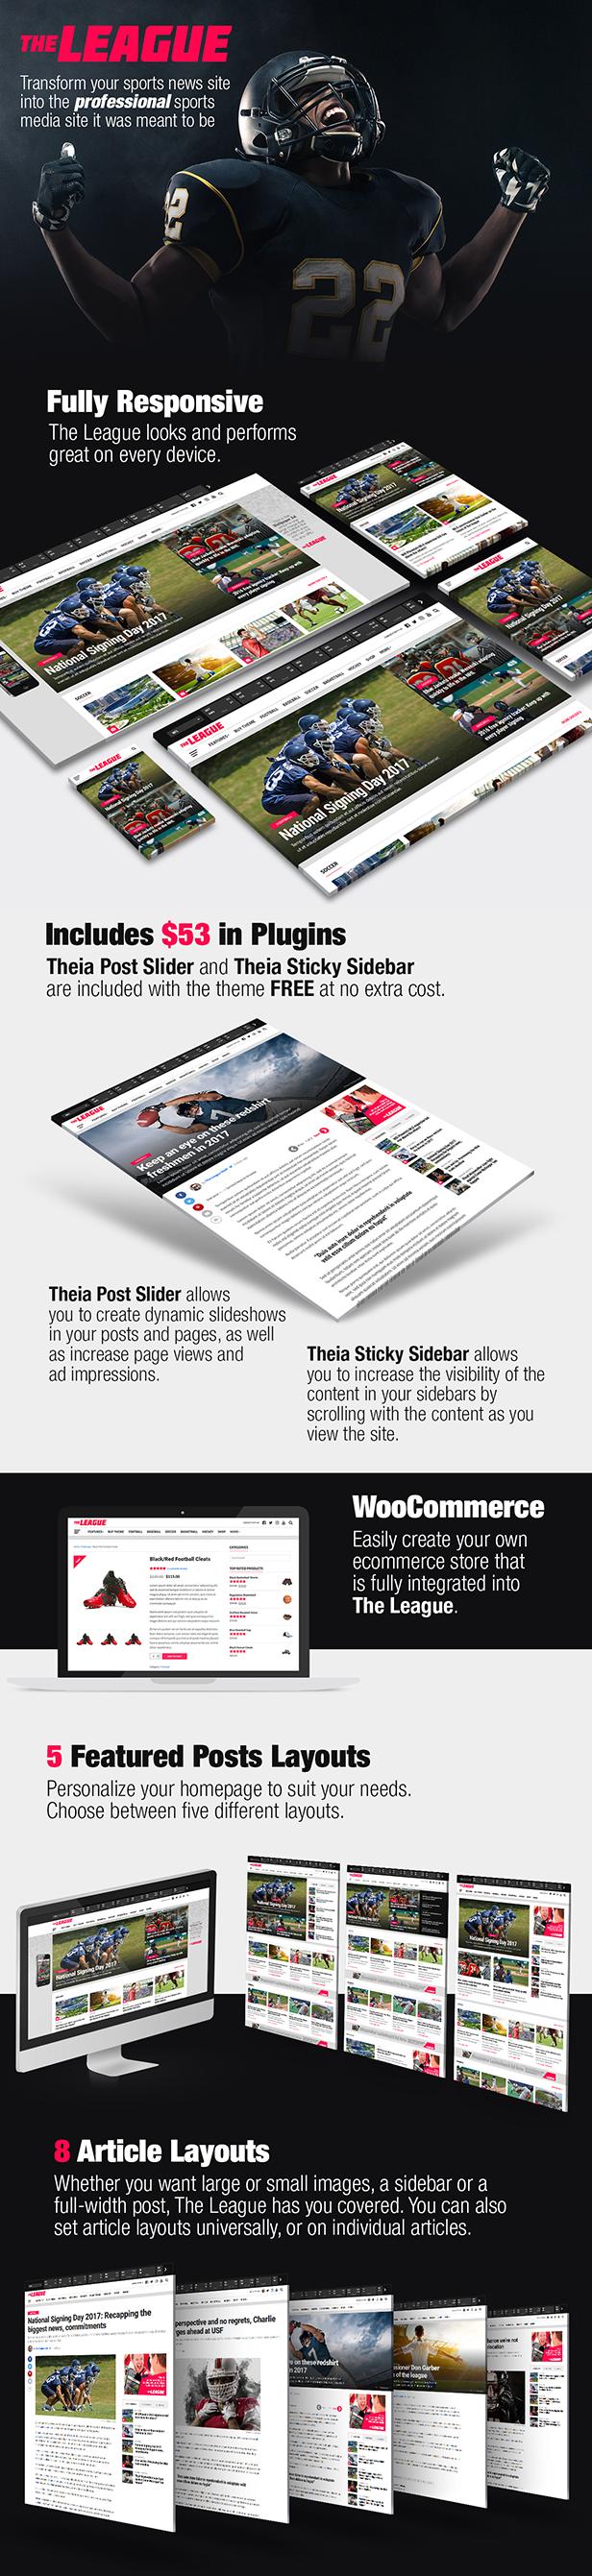 The League - Sports News & Magazine WordPress Theme - 2